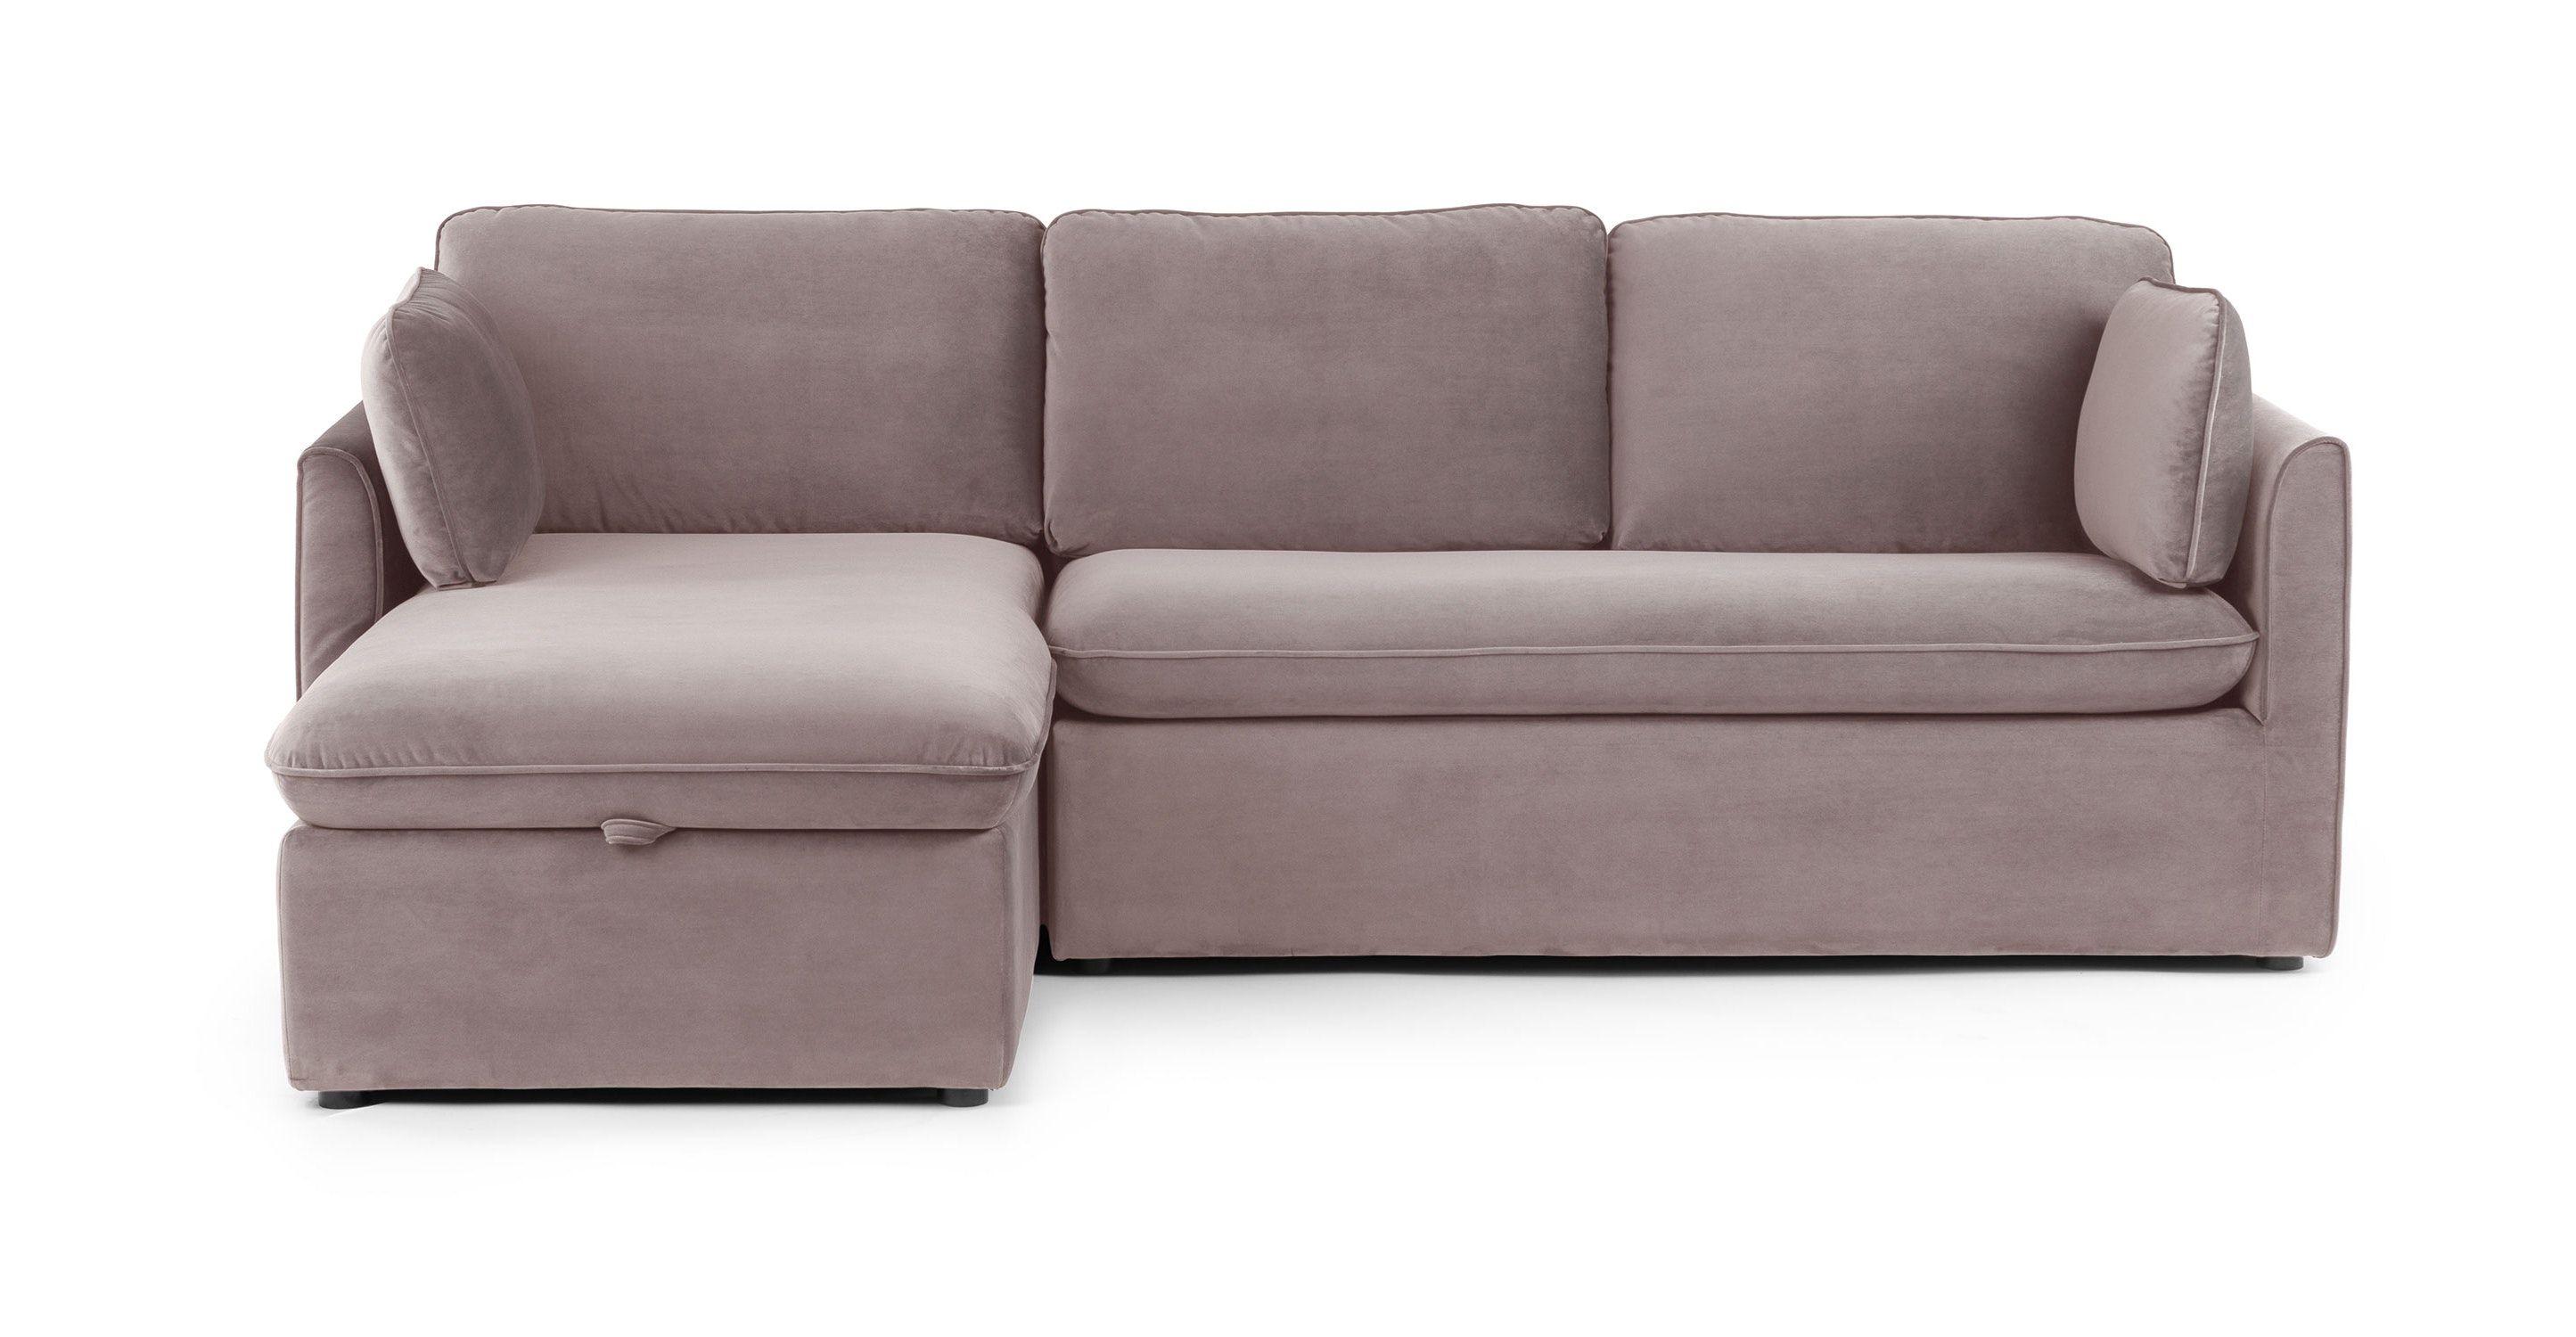 A Genuine Dream Machine The Oneira Sofa Bed Sleeps As Well As It